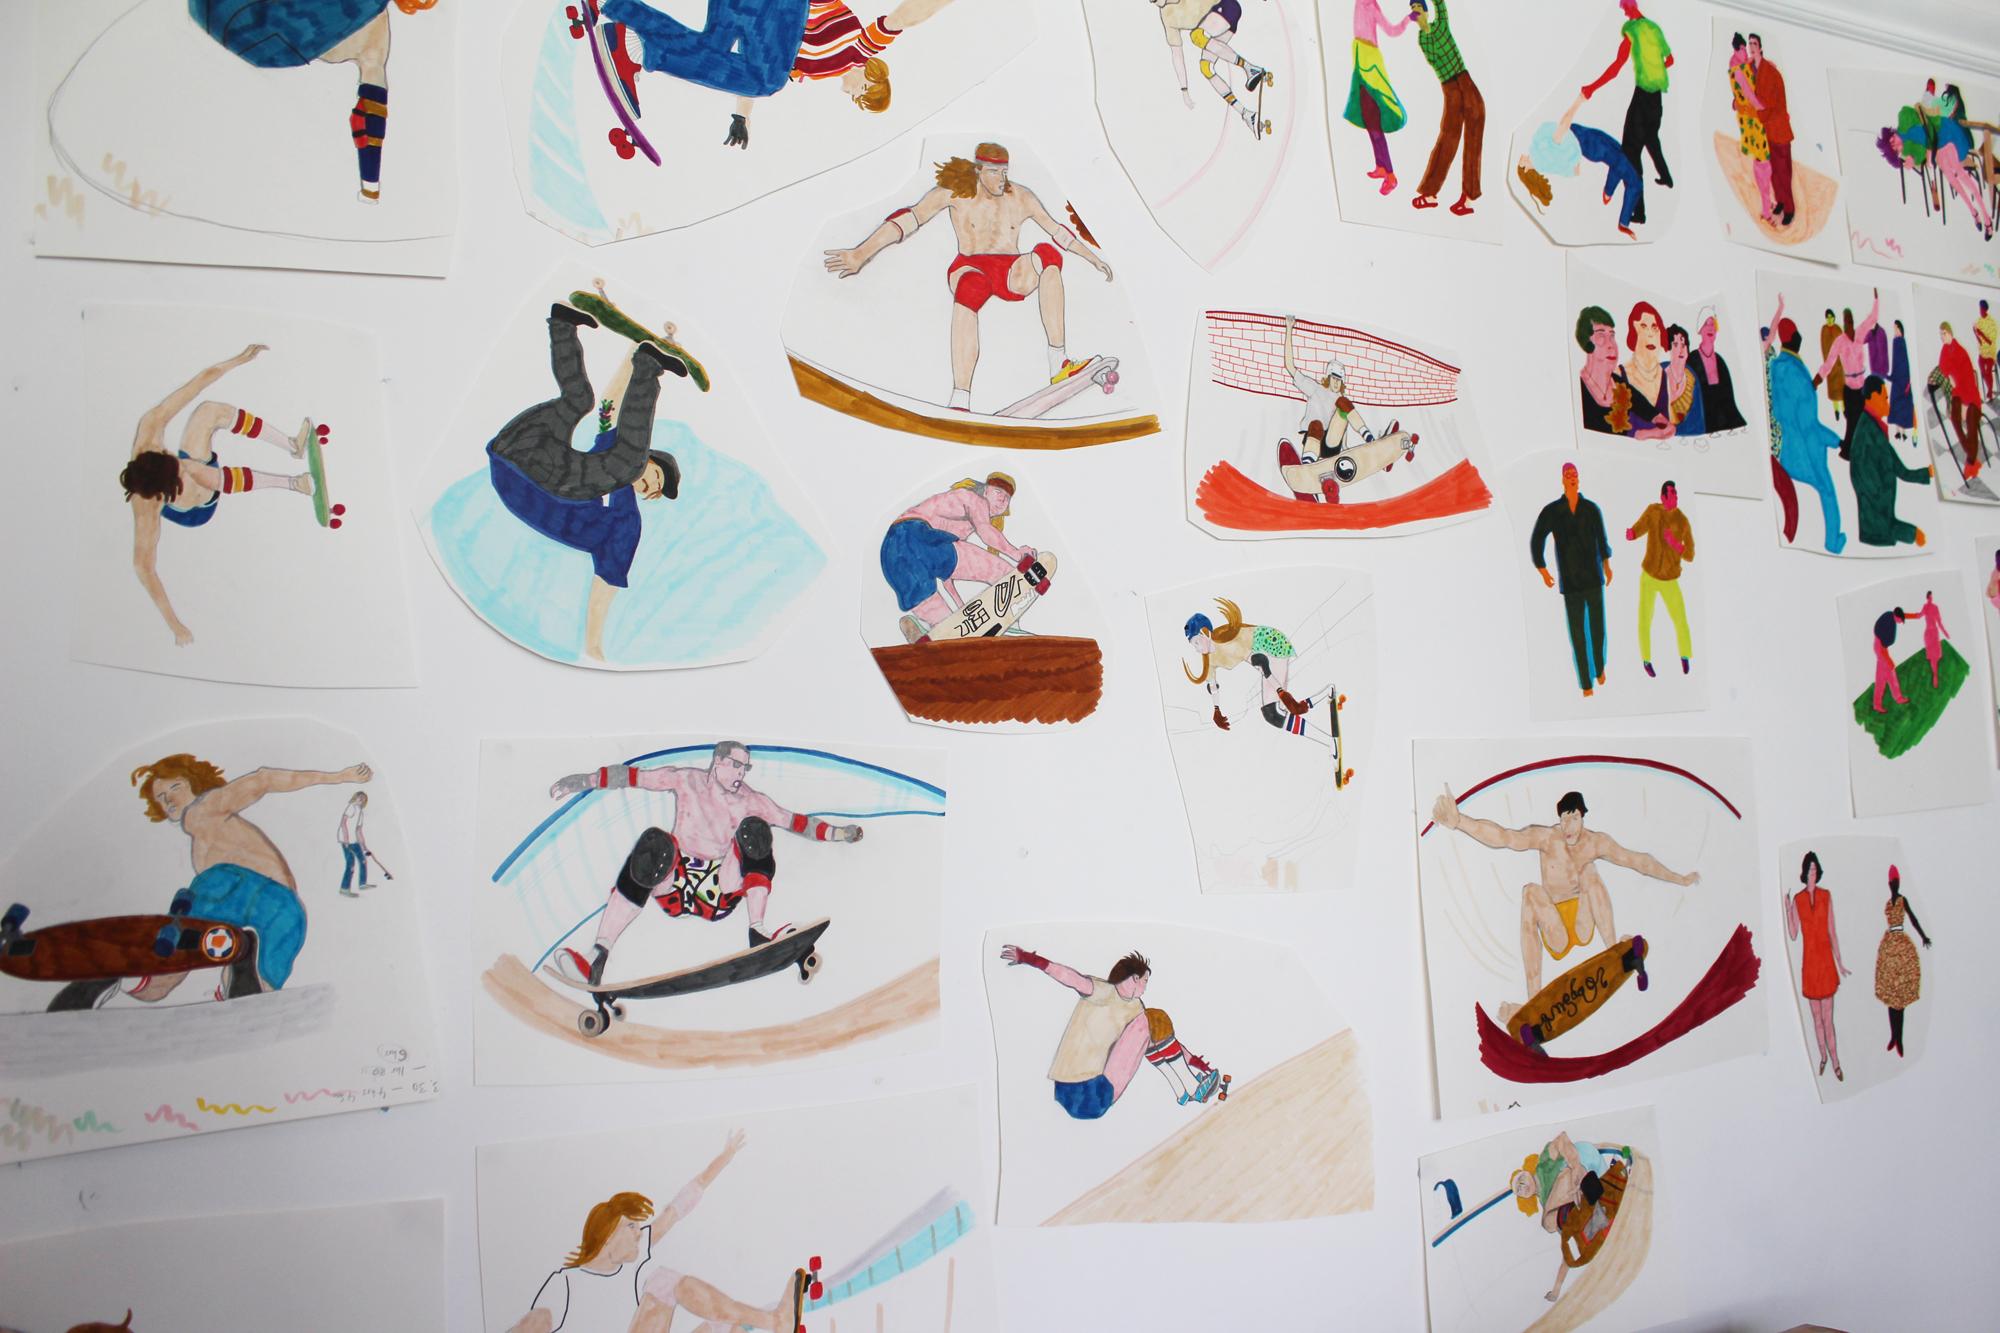 Pool Skaters and Jazz Club original drawings on studio wall